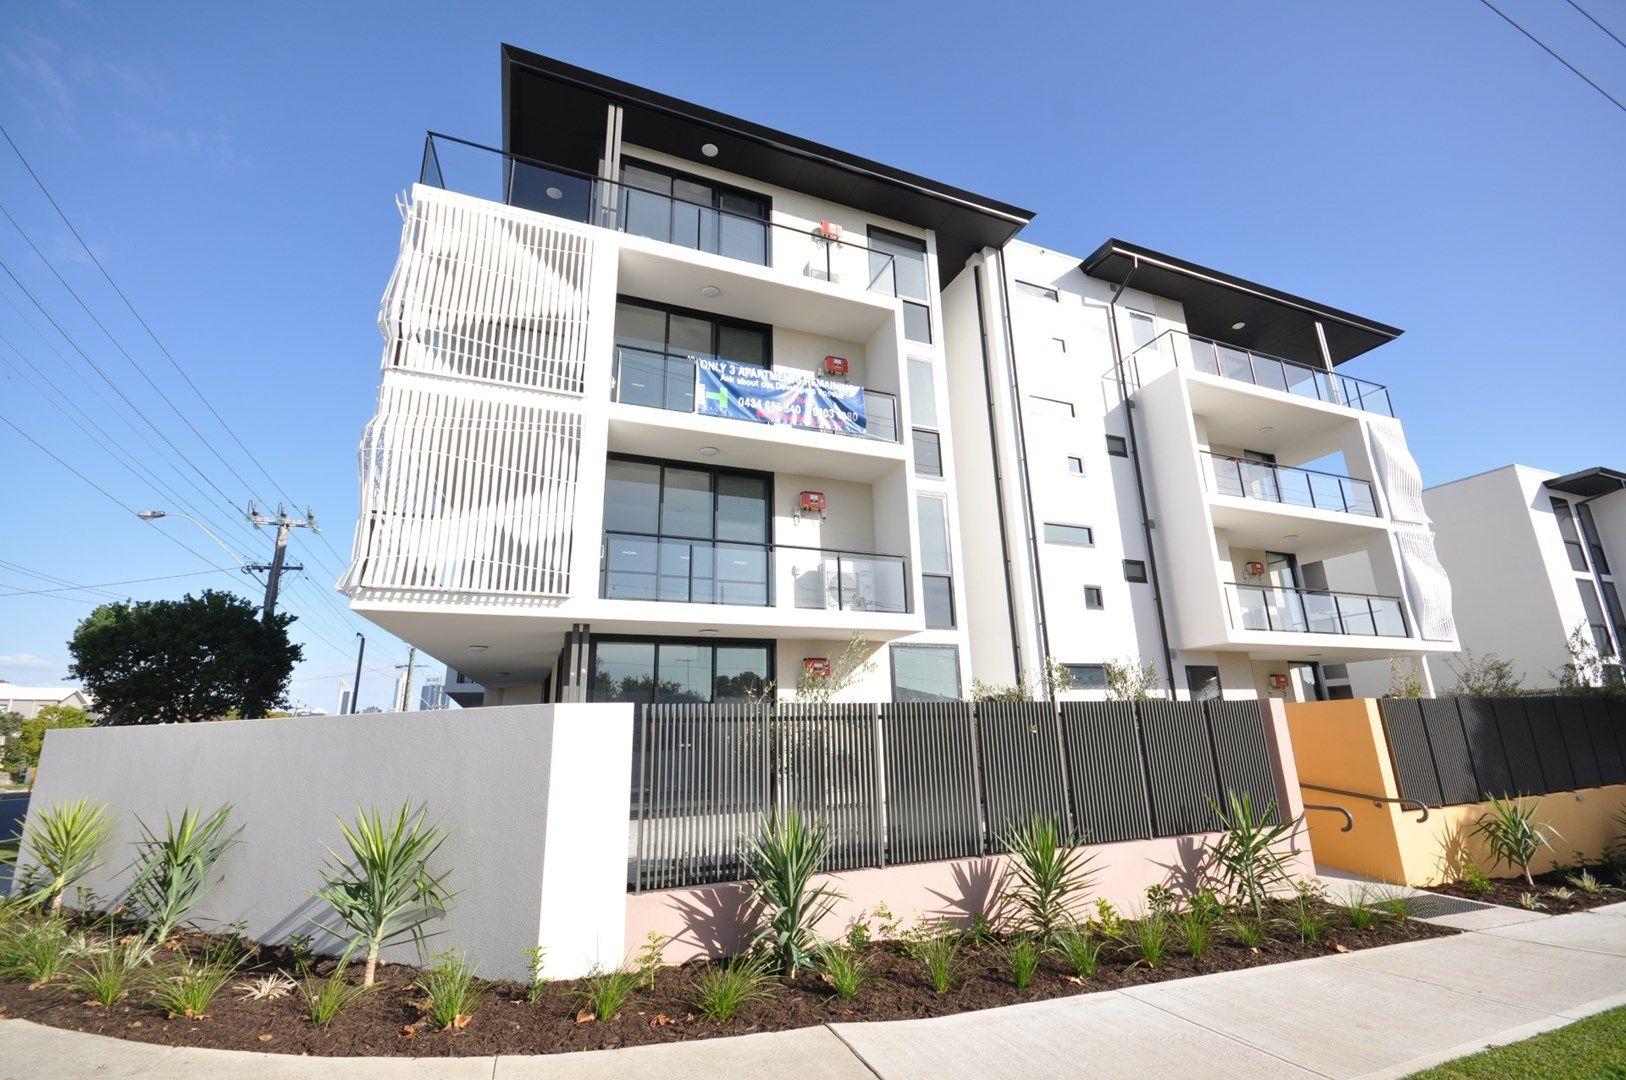 38/1 Bourke Street, North Perth WA 6006, Image 0